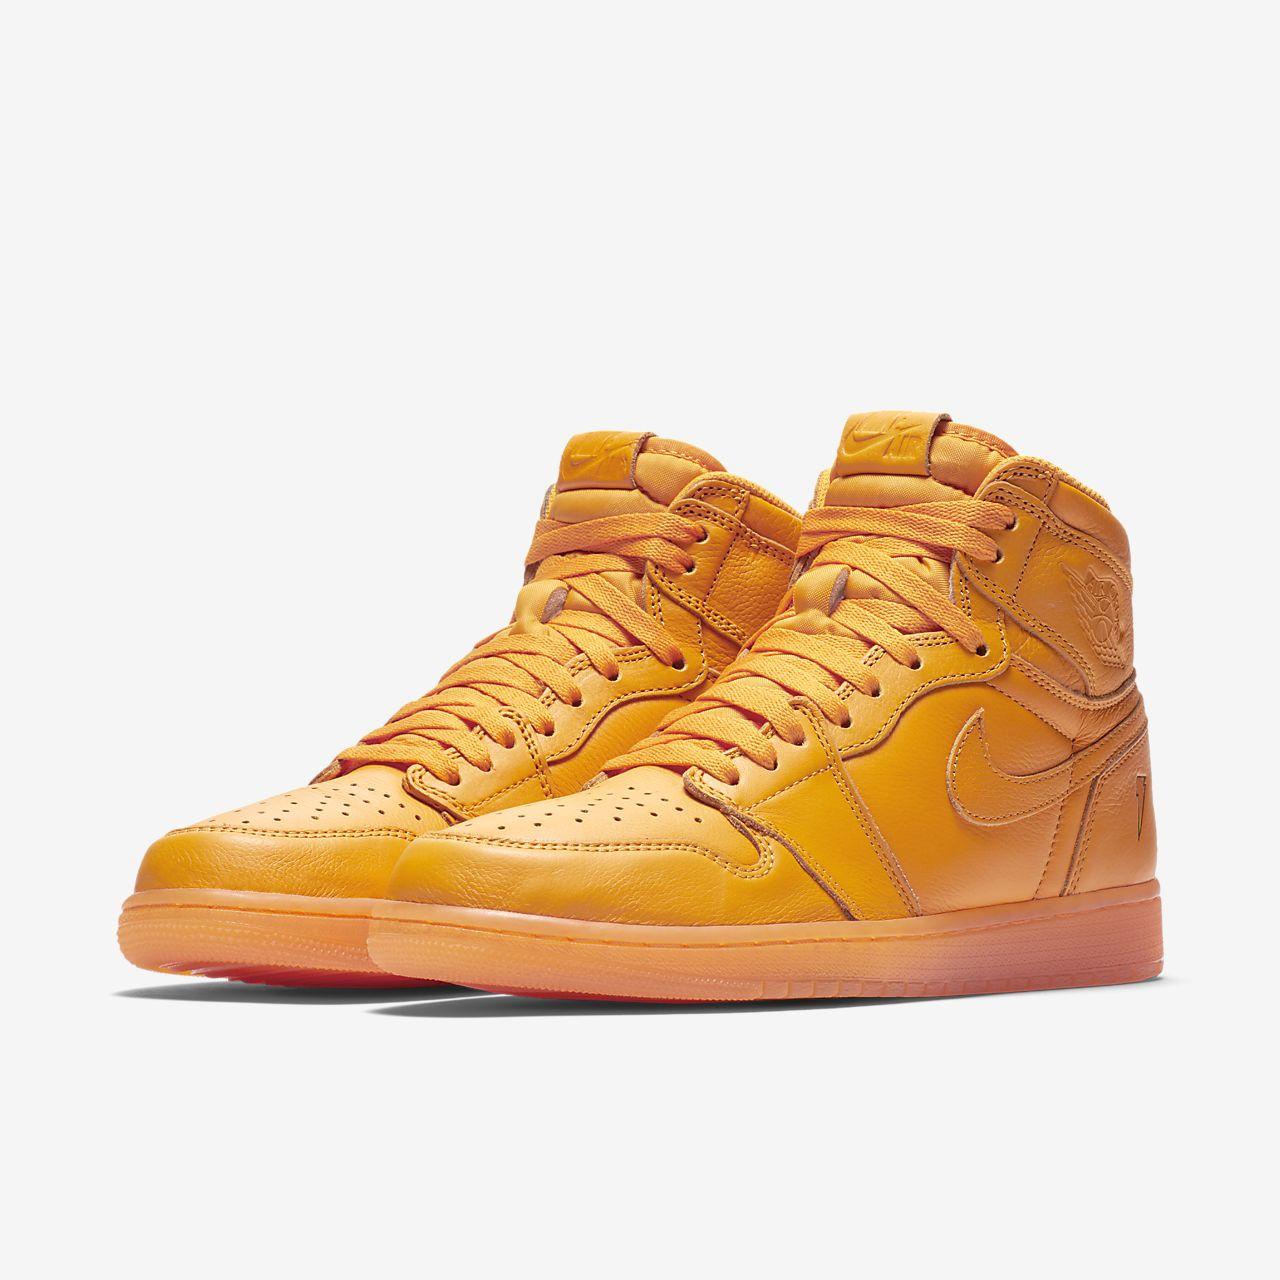 hot sale online d701c a64d4 Air Jordan 1 Retro High OG  Orange